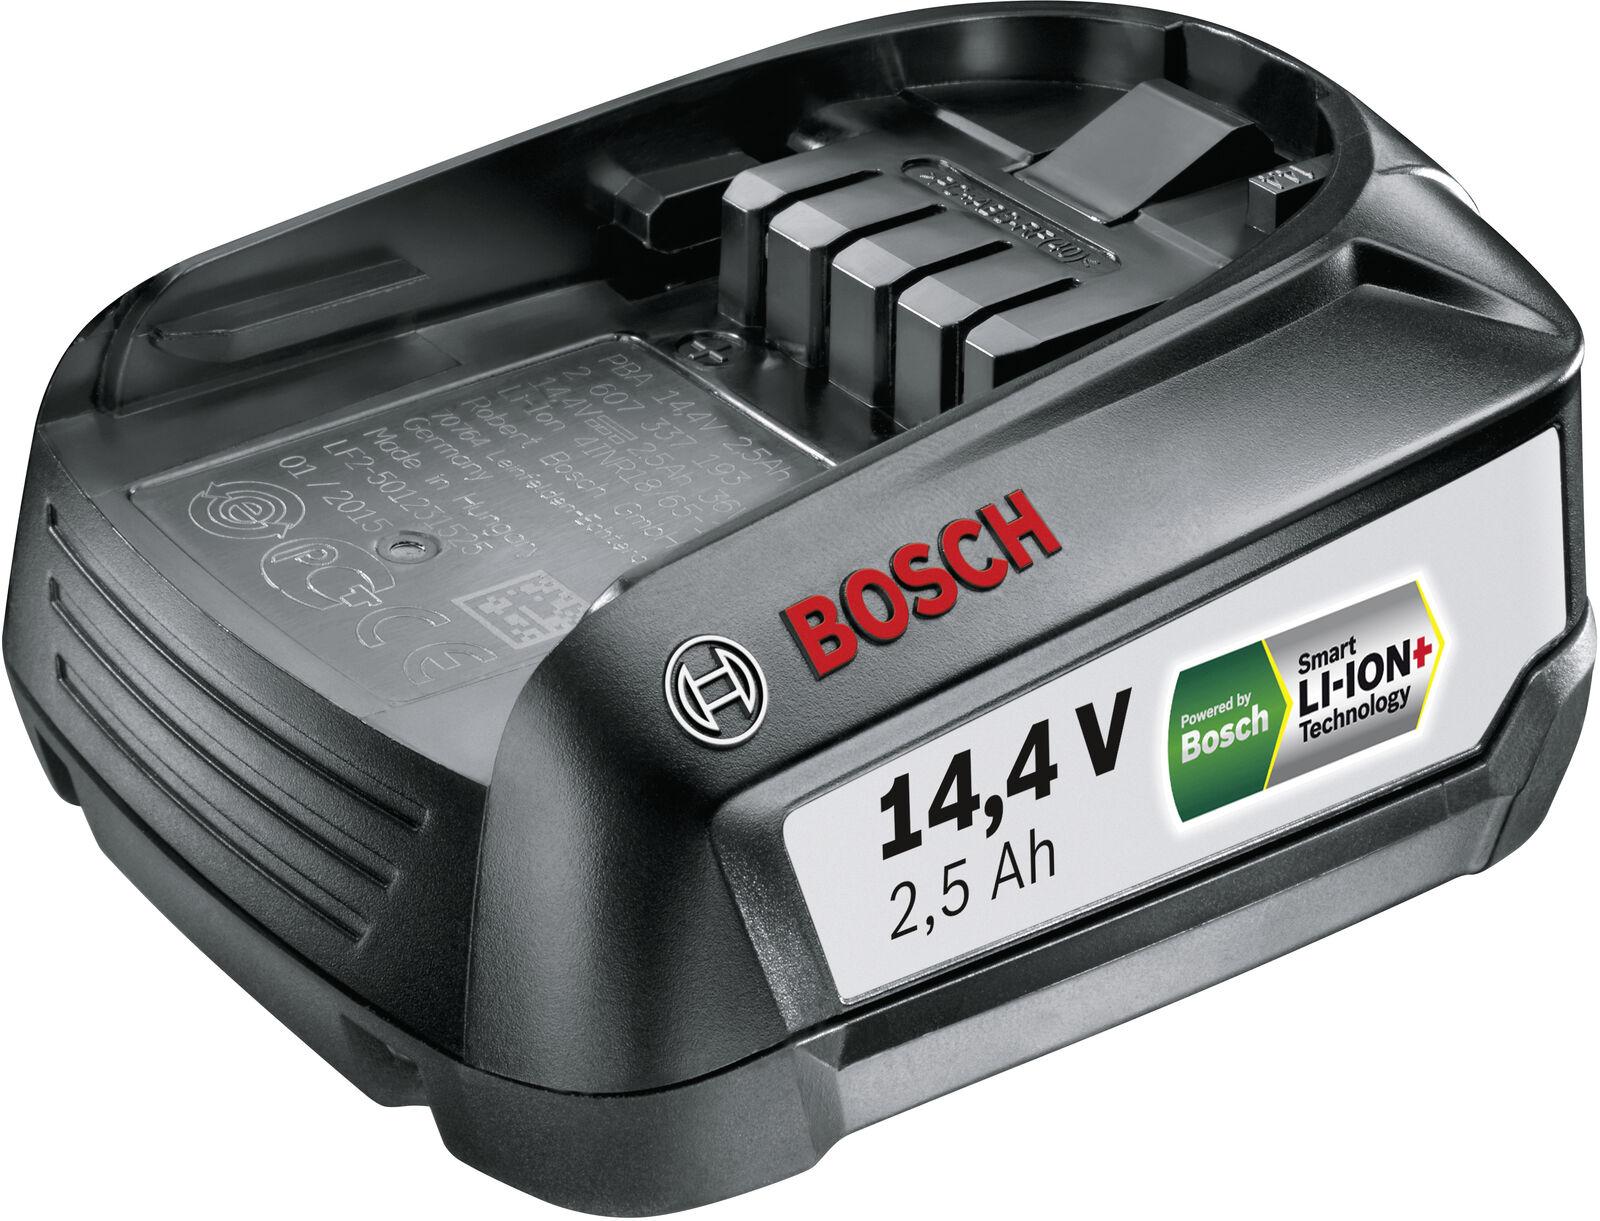 Bosch Ersatz-Akku  - PBA 14,4 V LI-Ion 2,5 Ah